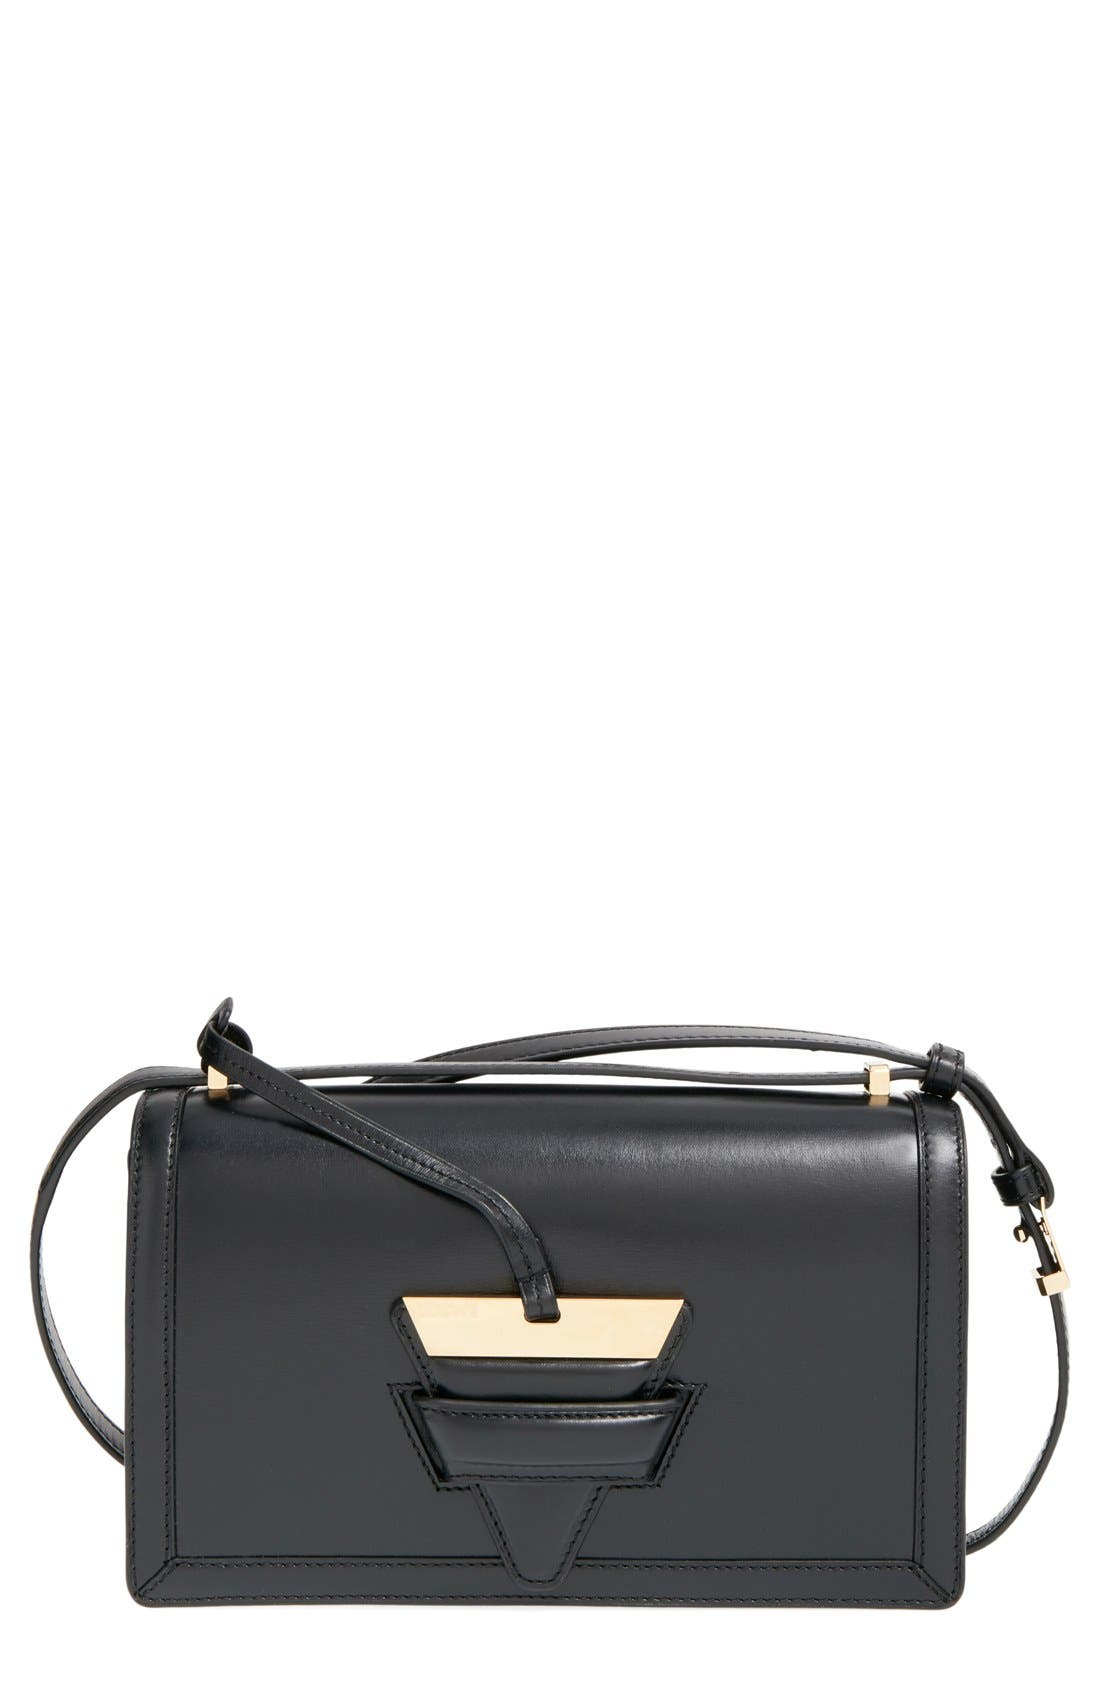 Loewe 'Barcelona' Shoulder Handbag